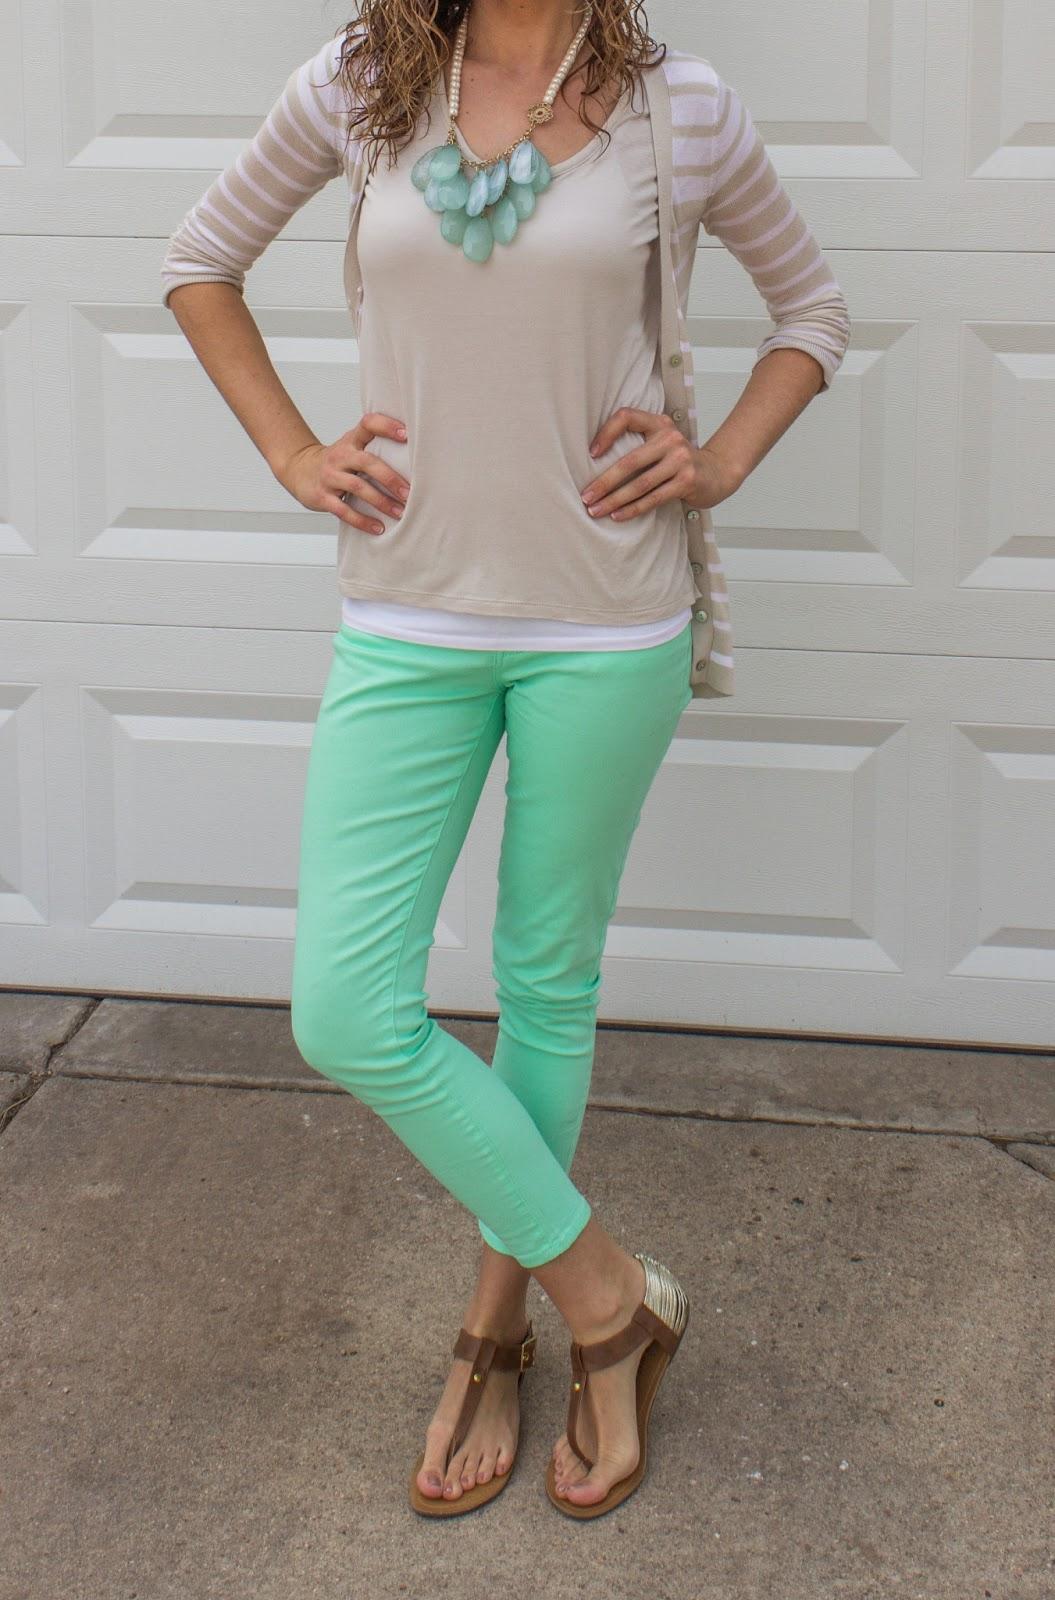 Wear Wednesday: Mint Pants & Tan Sweater by Colorado fashion blogger Eat Pray Wear Love